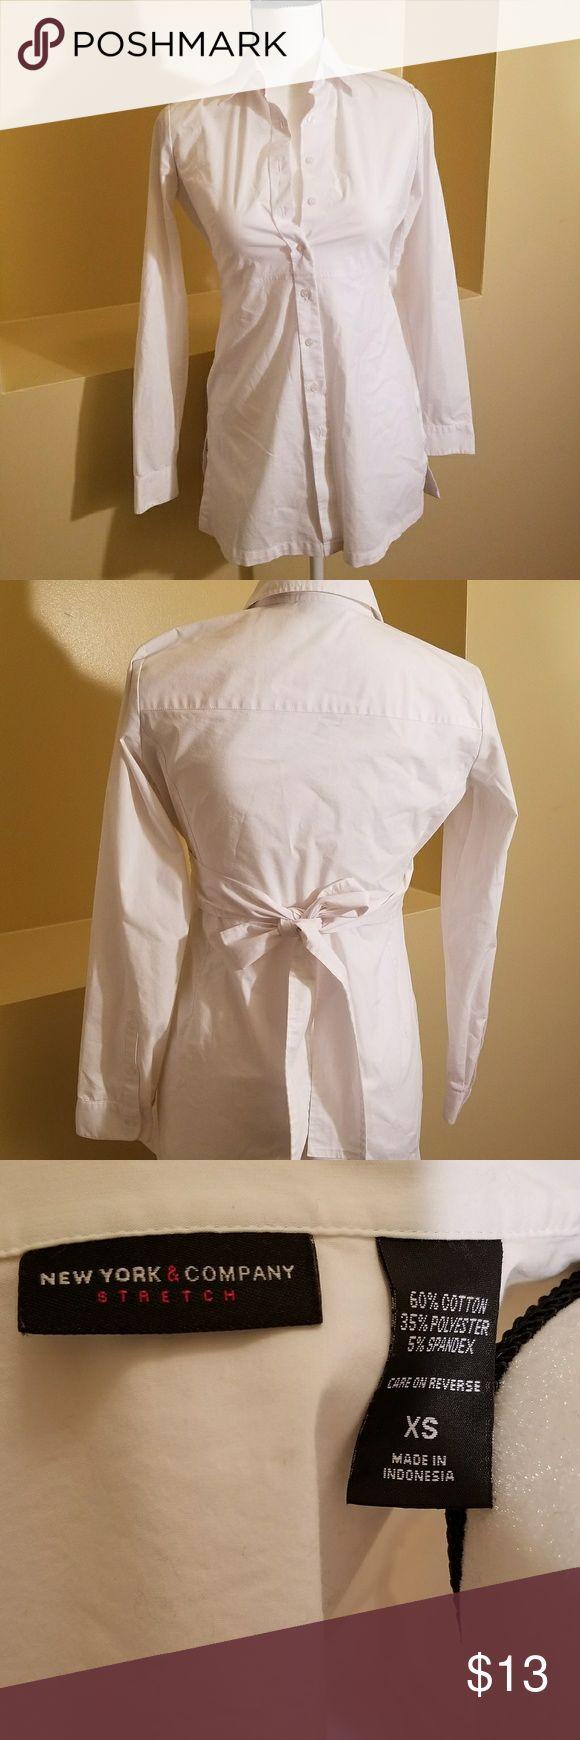 White button down shirt New York & Company white button down shirt with tie in back New York & Company Tops Button Down Shirts